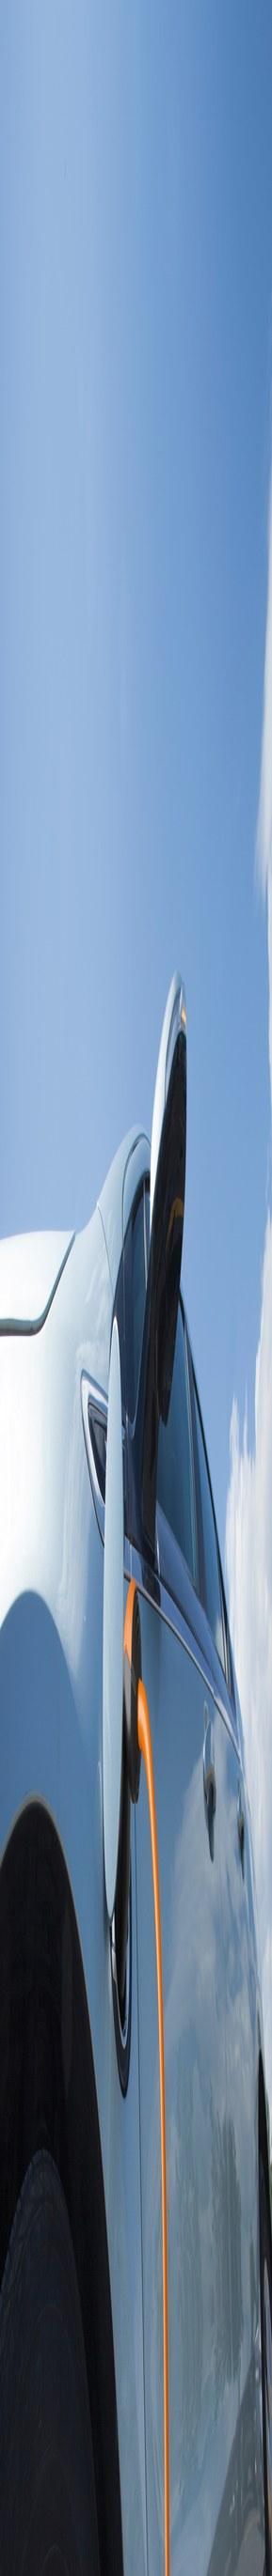 eMobility Bild zugeschnitten